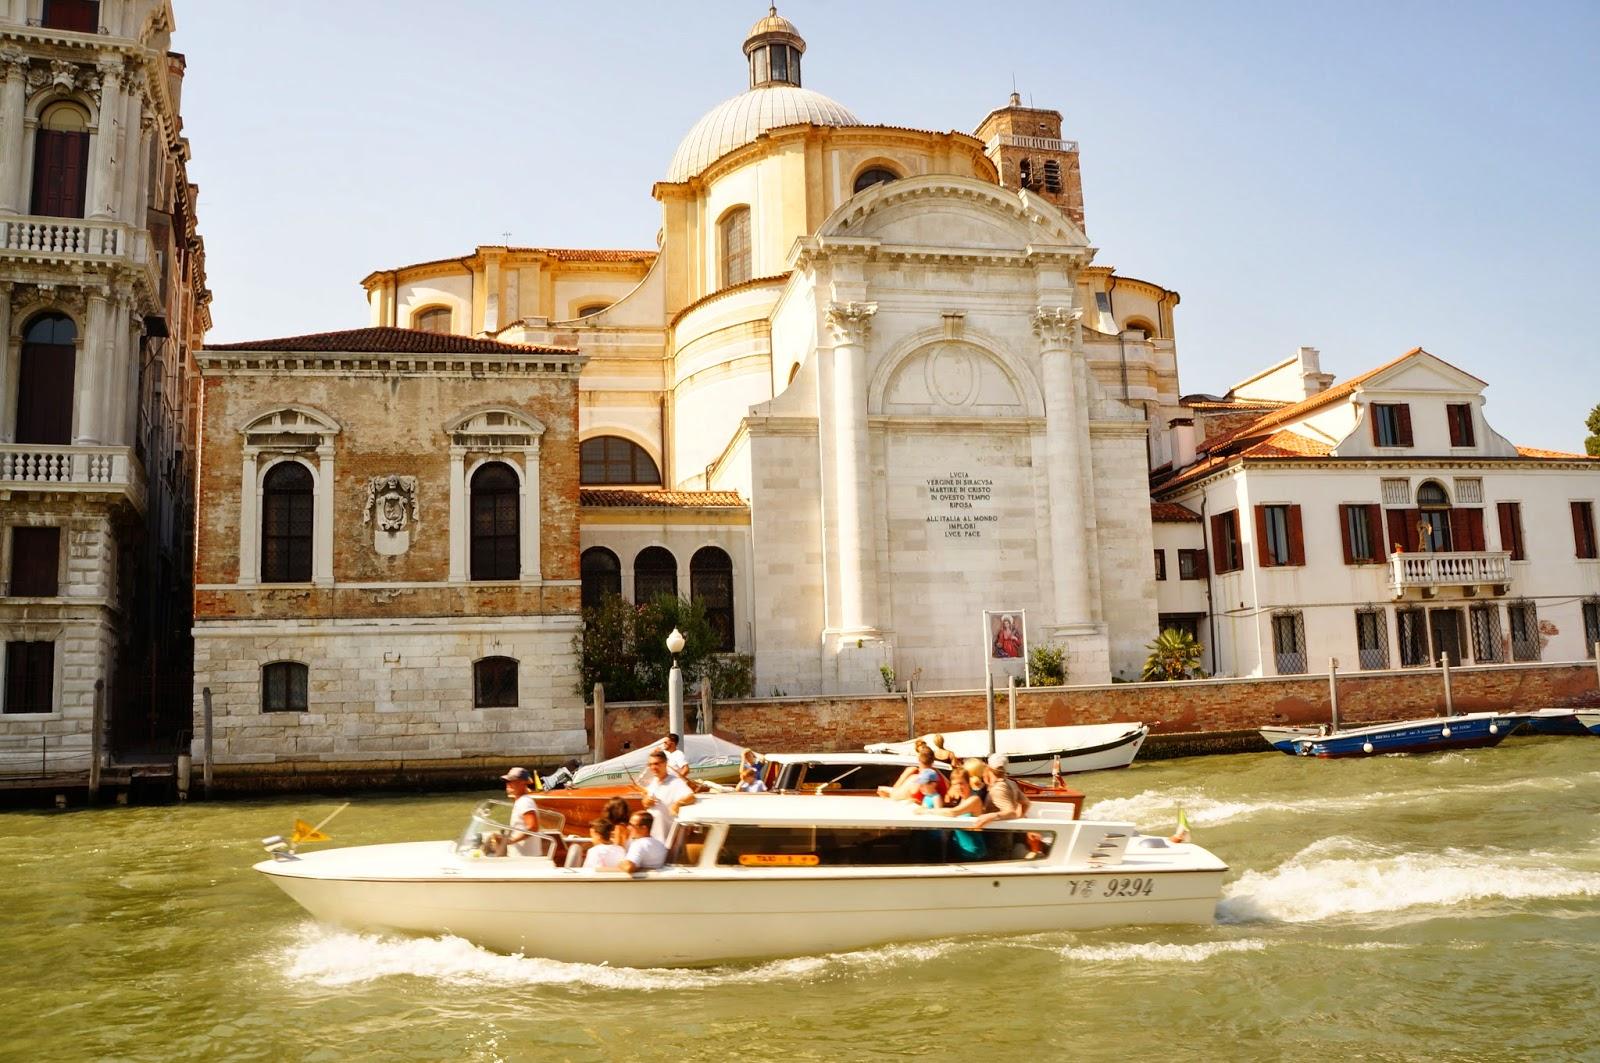 По воде в Венеции